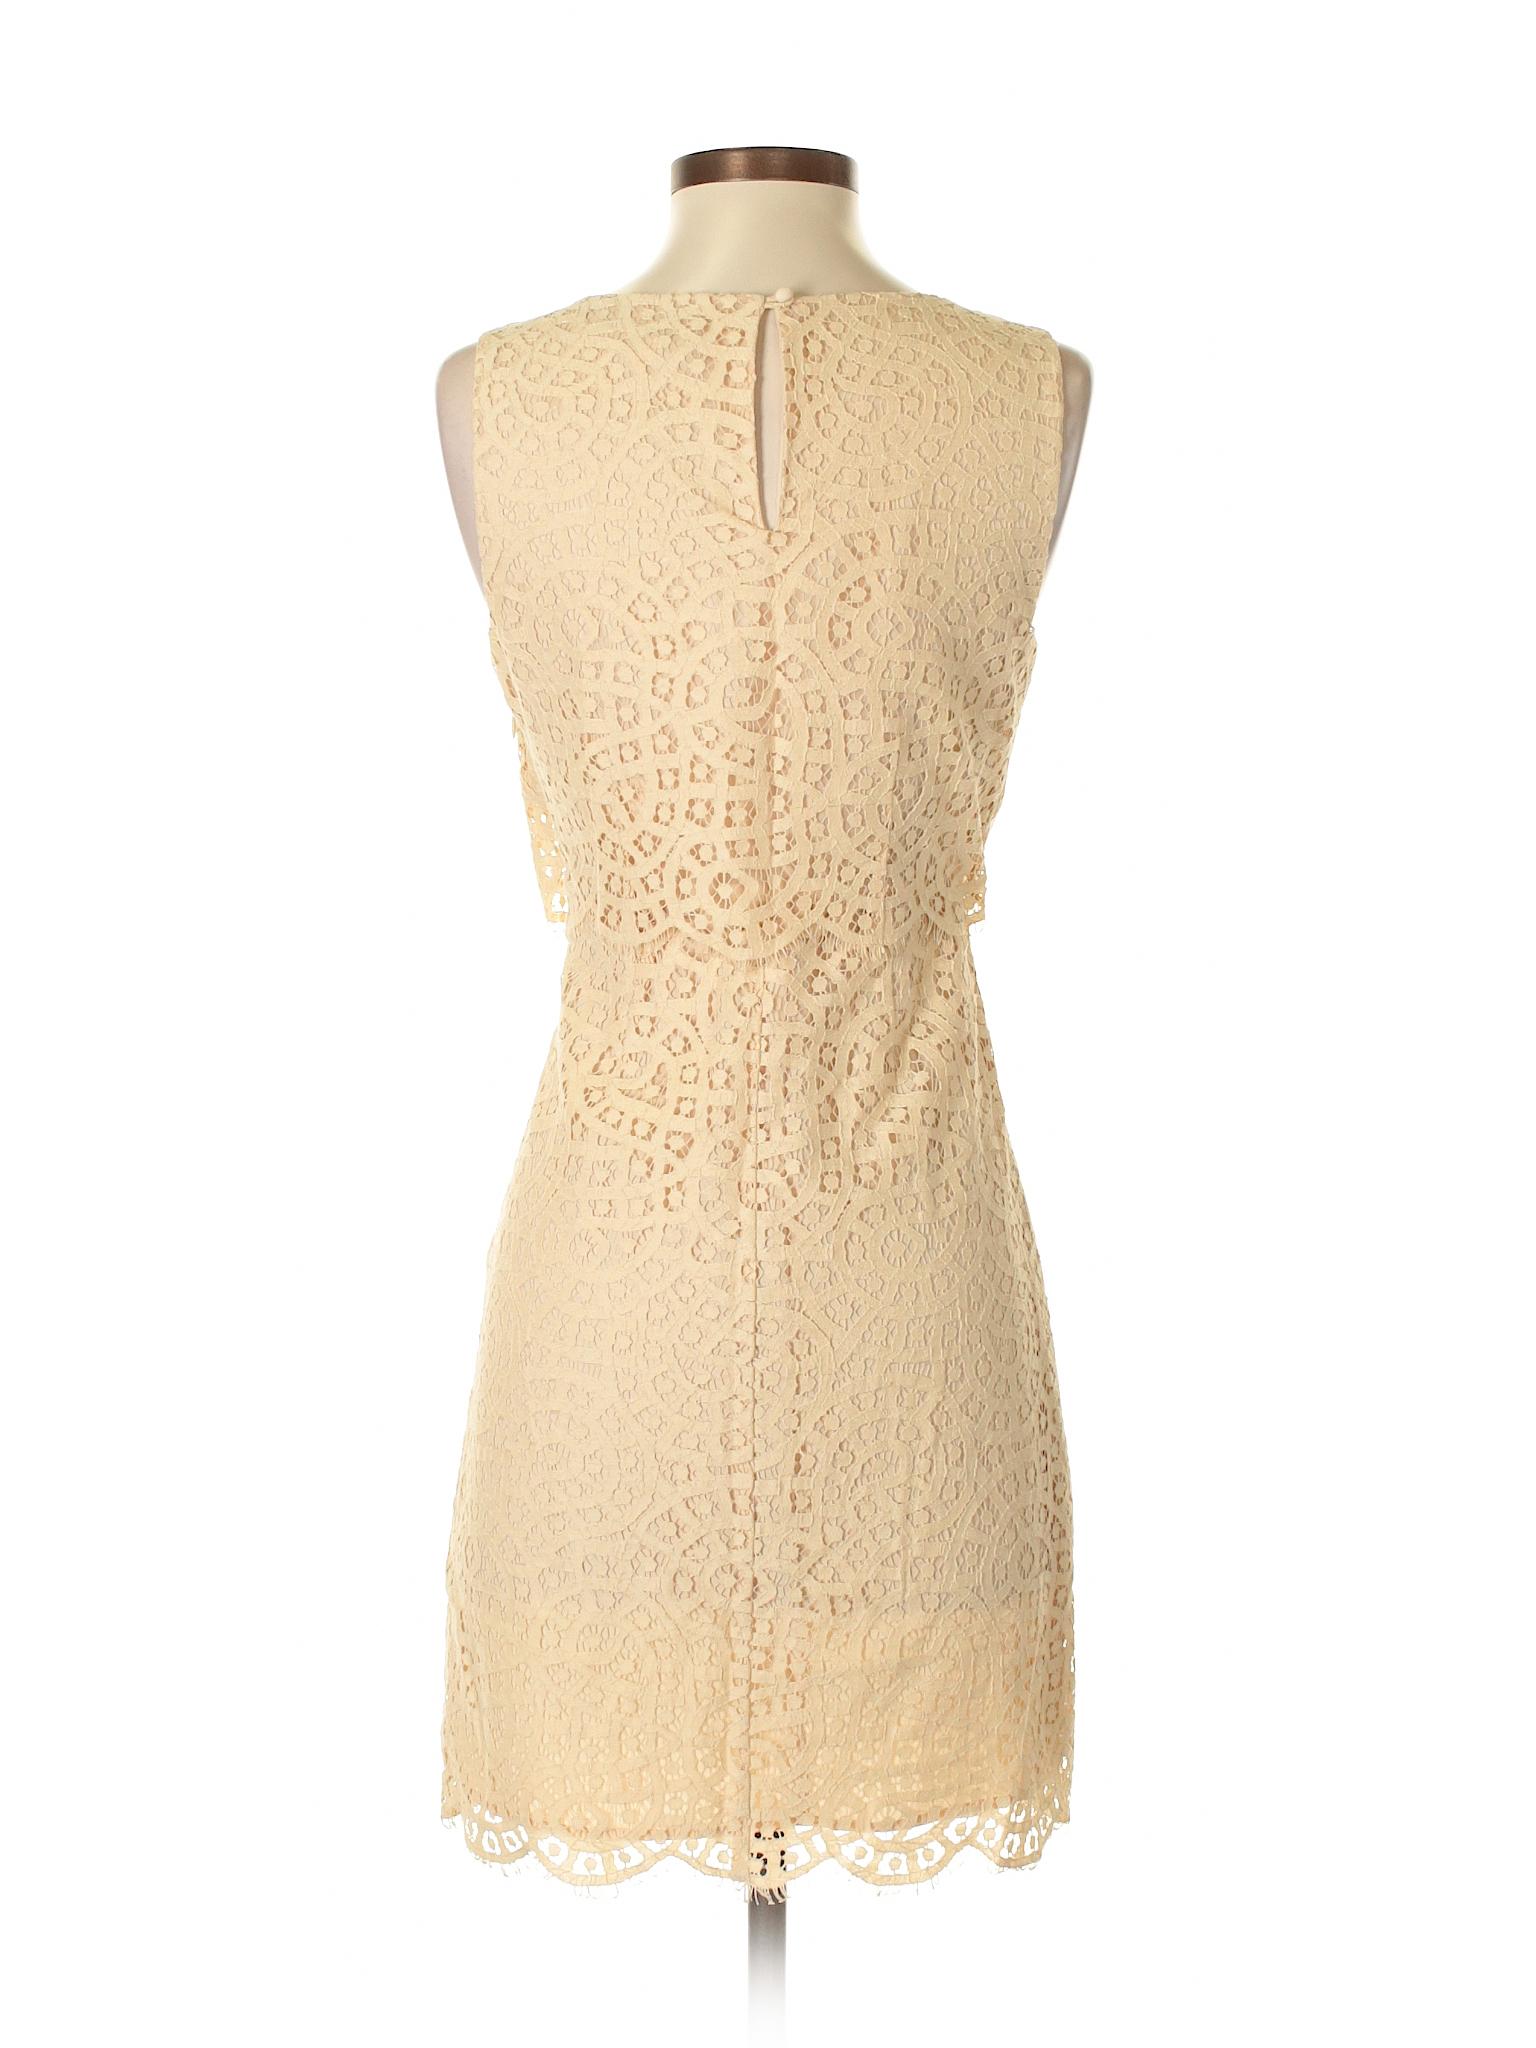 J Boutique winter Casual Crew Dress UpFrw5p6W